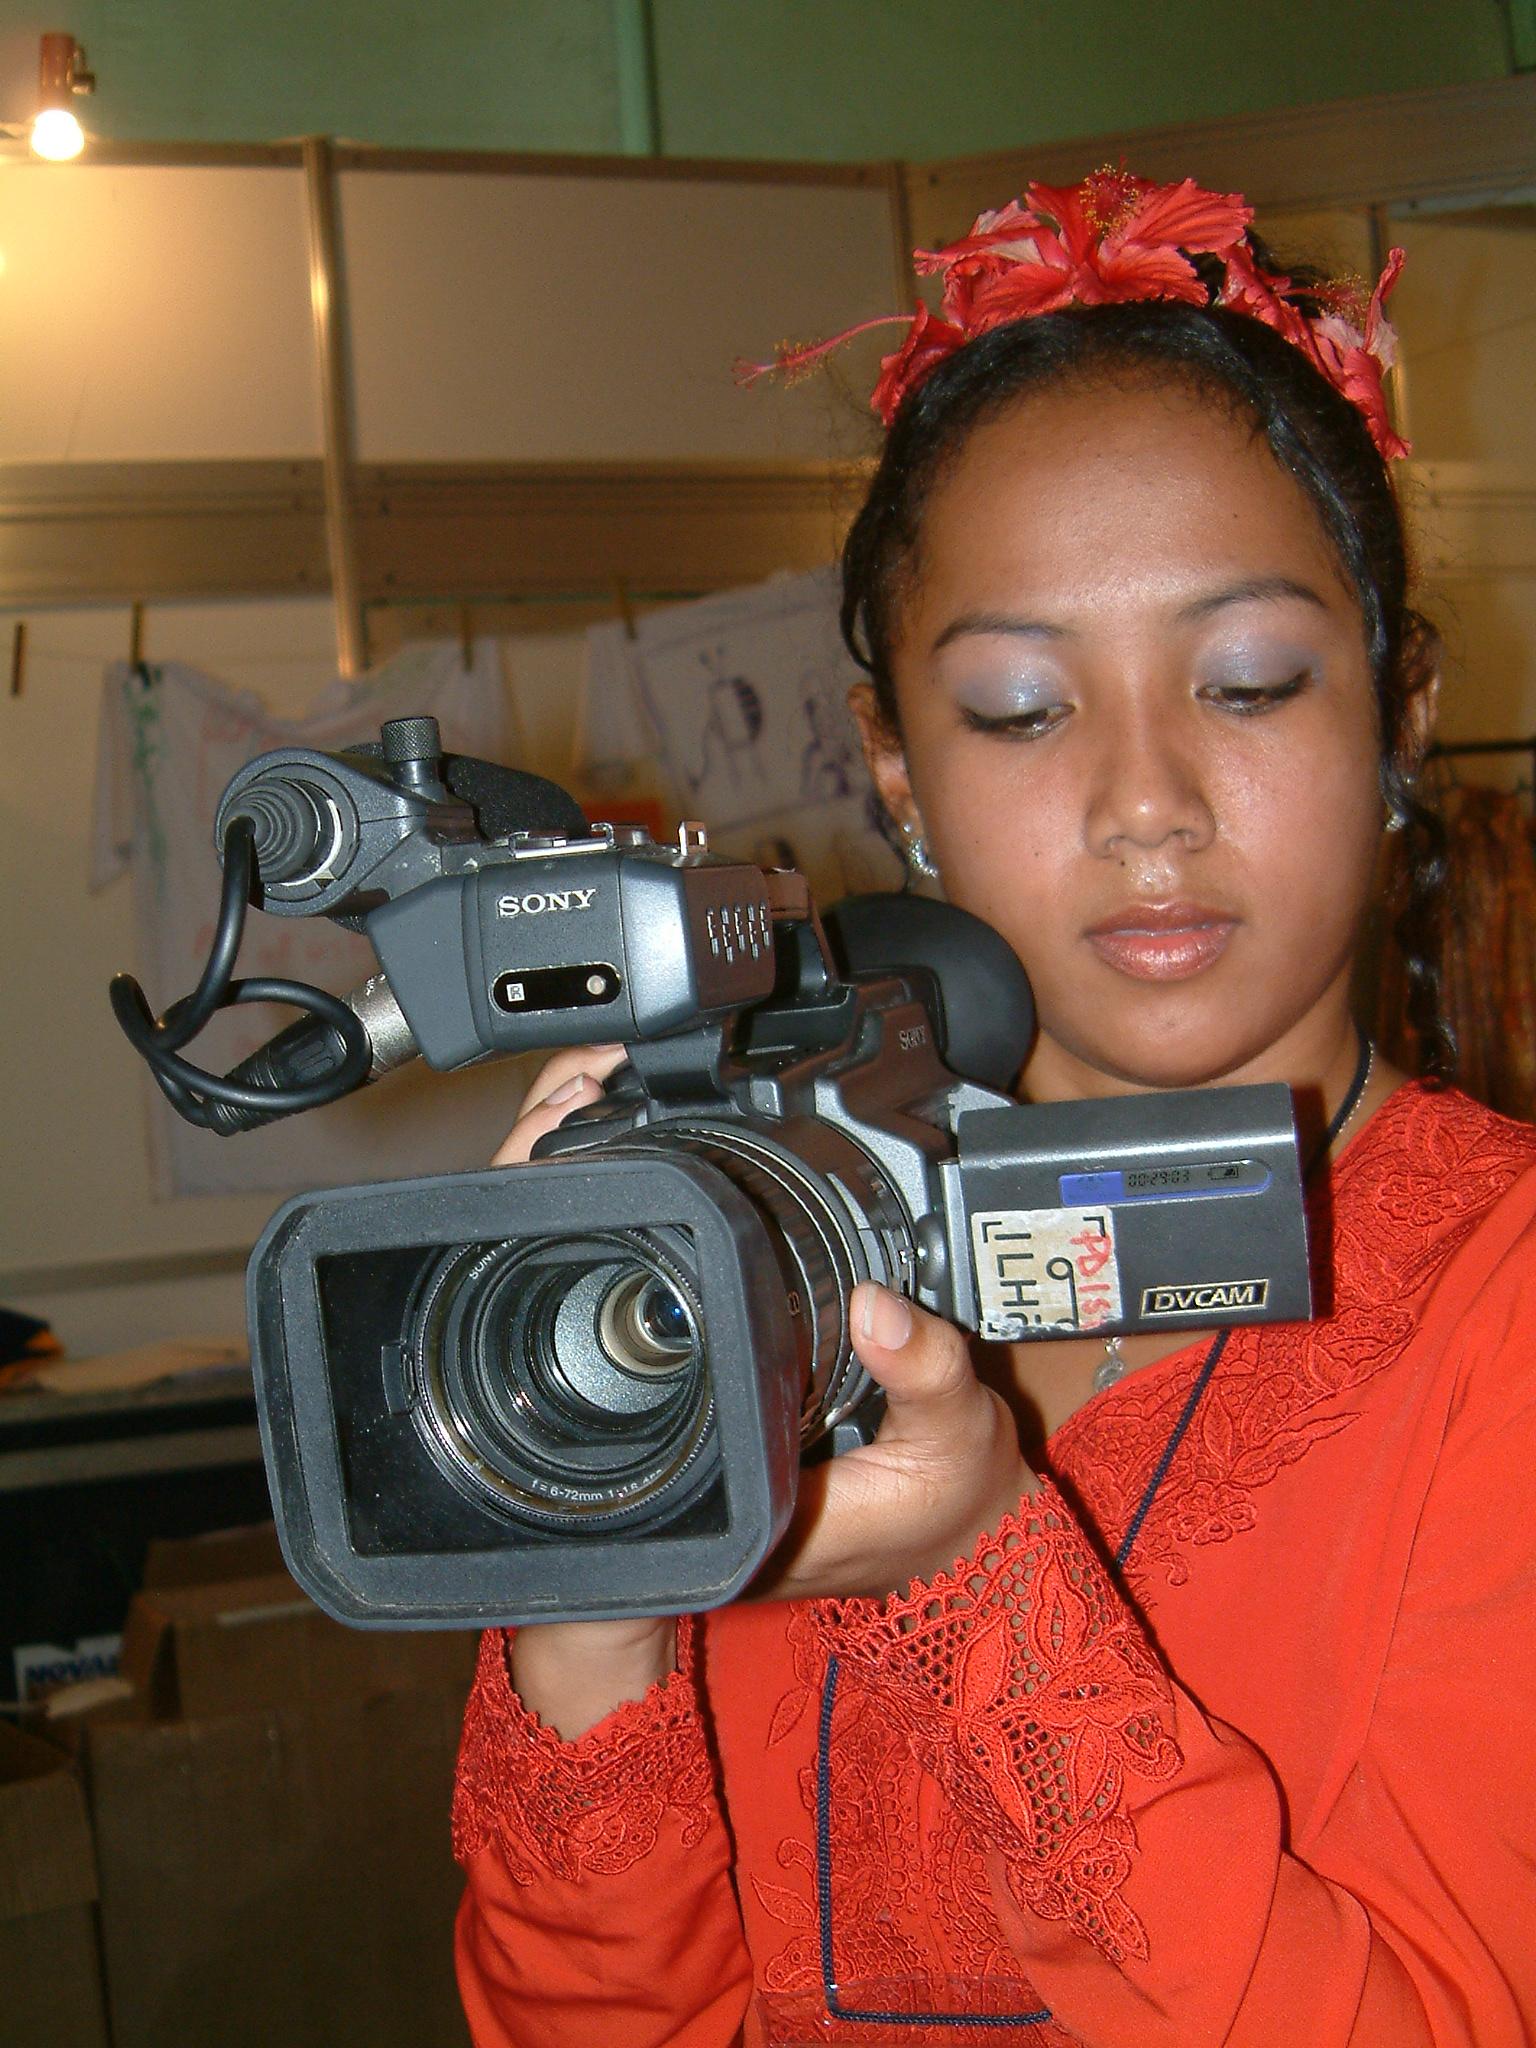 Description young girl with a camera